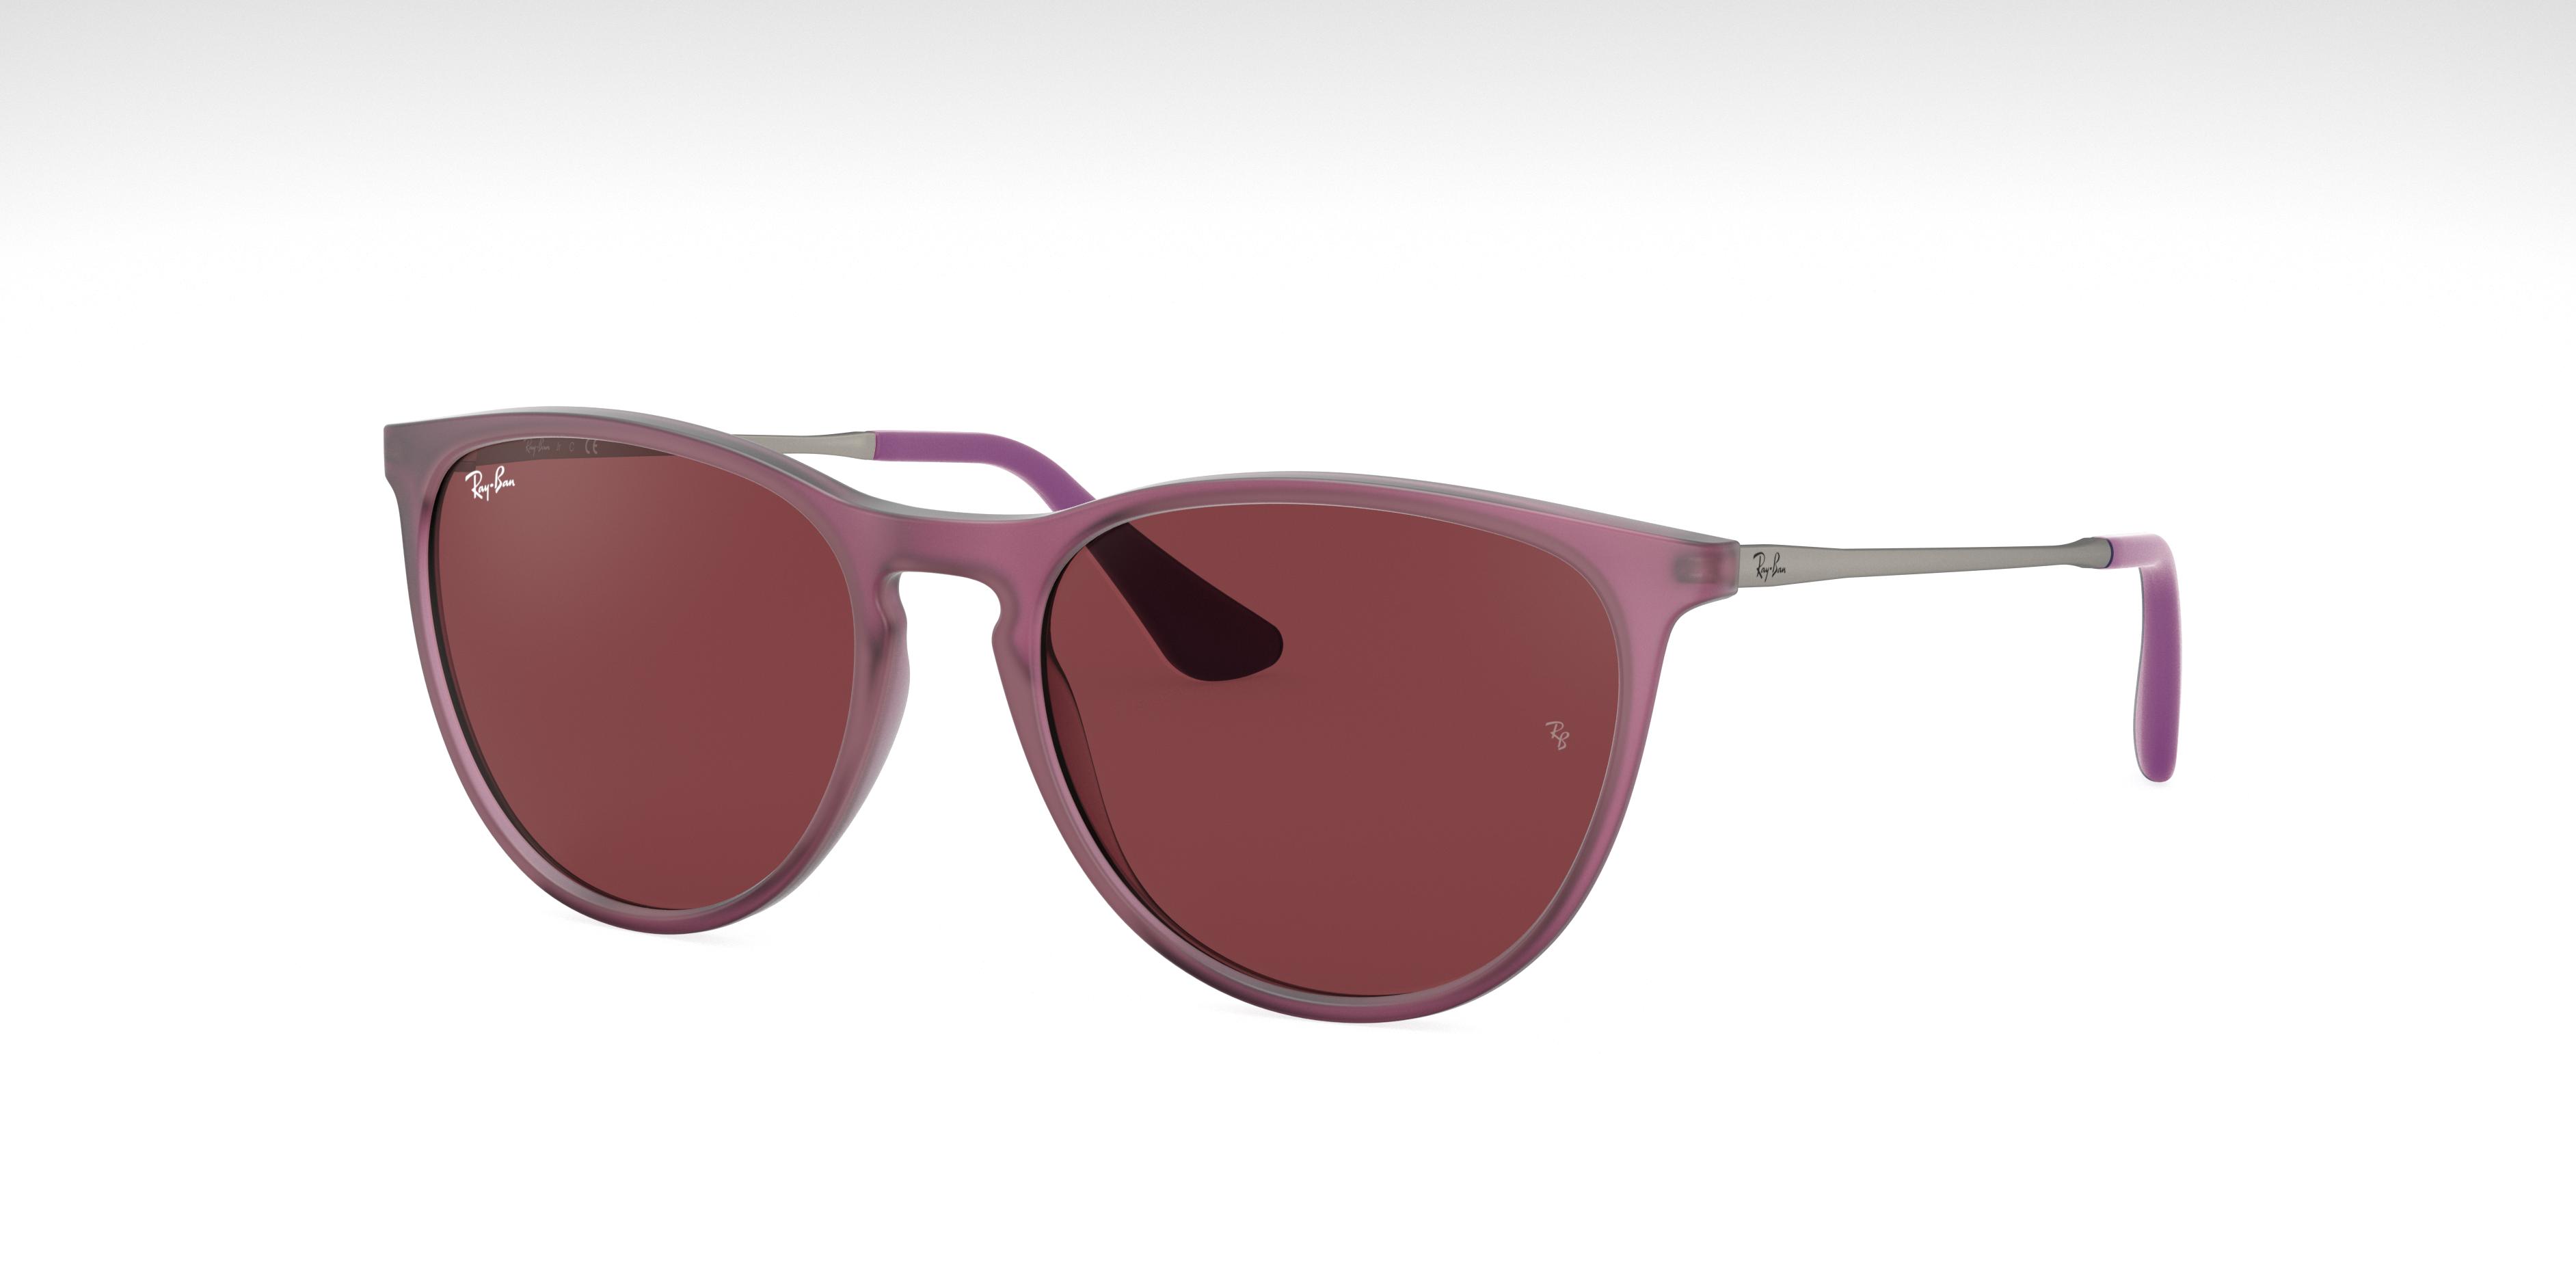 Ray-Ban Izzy Silver, Violet Lenses - RJ9060S